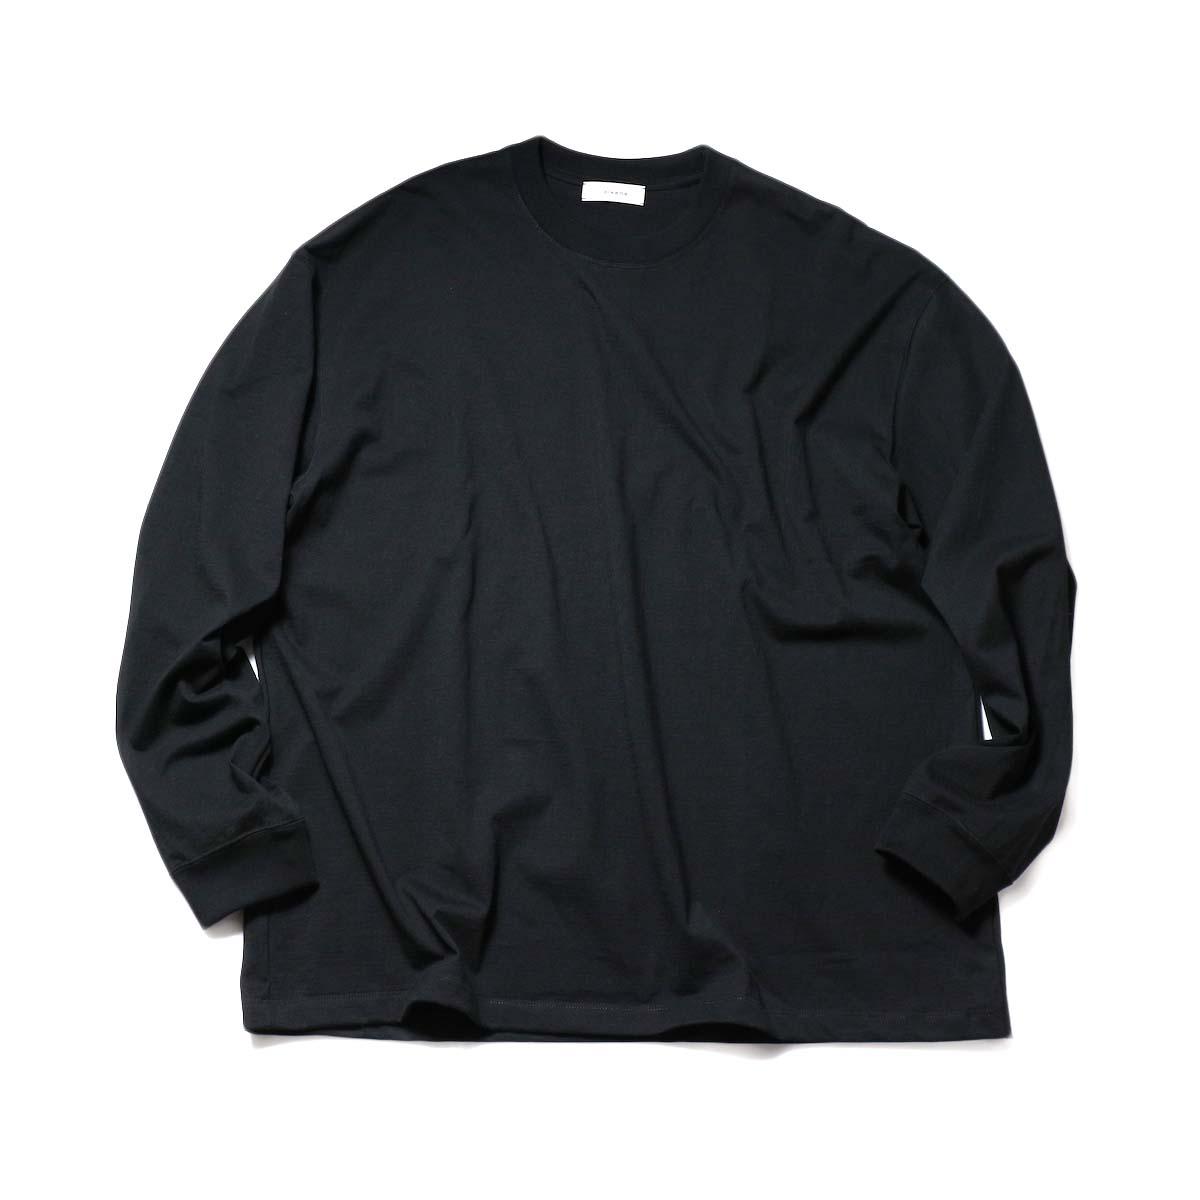 alvana / TANGUIS L/S TEE SHIRTS (Black)